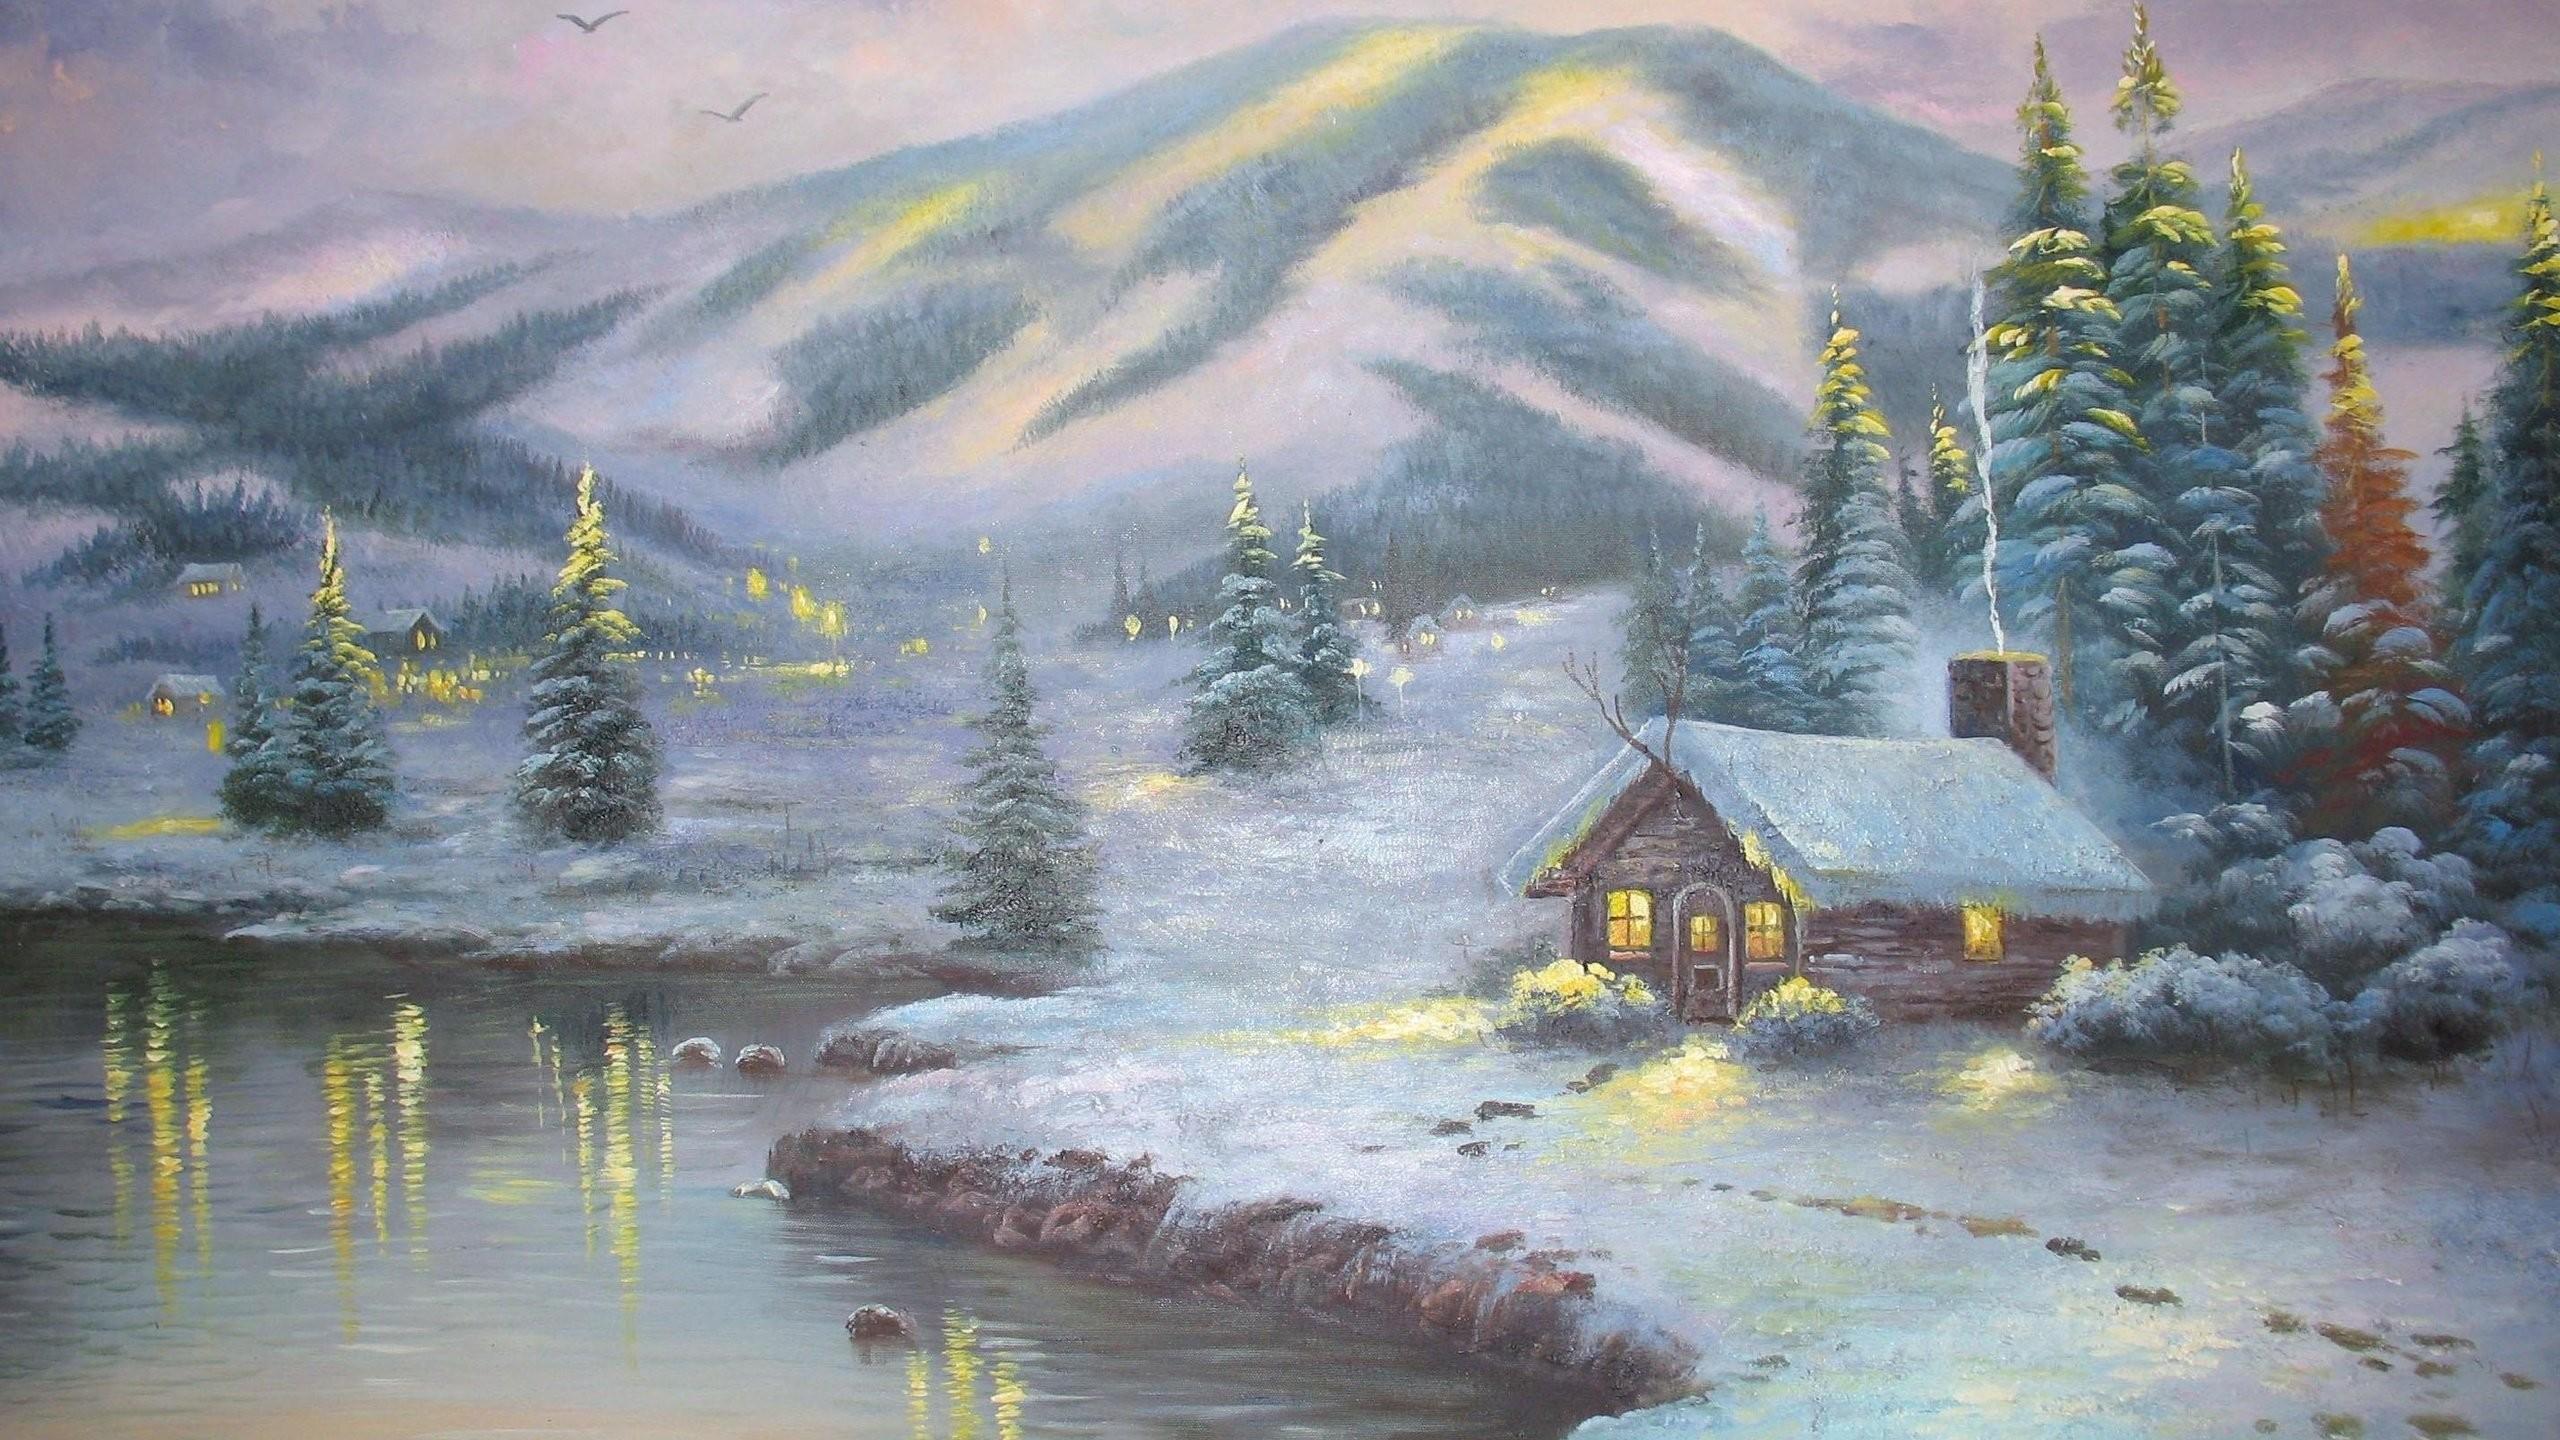 Thomas kinkade winter wallpaper wallpapertag for Foto inverno per desktop